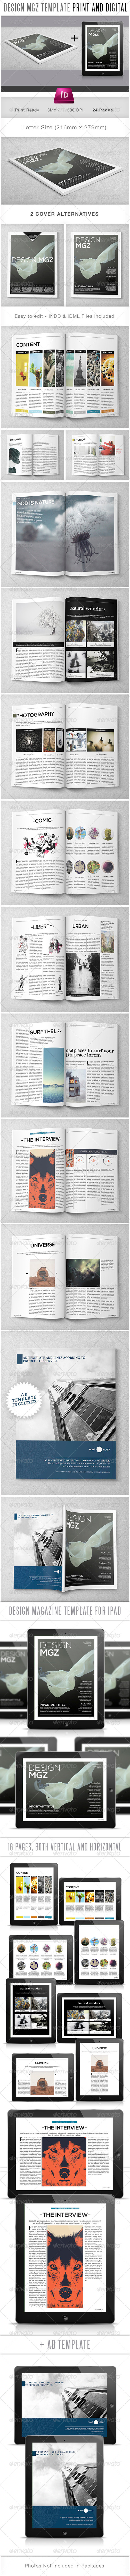 GraphicRiver Design MGZ Print & Digital 5327488